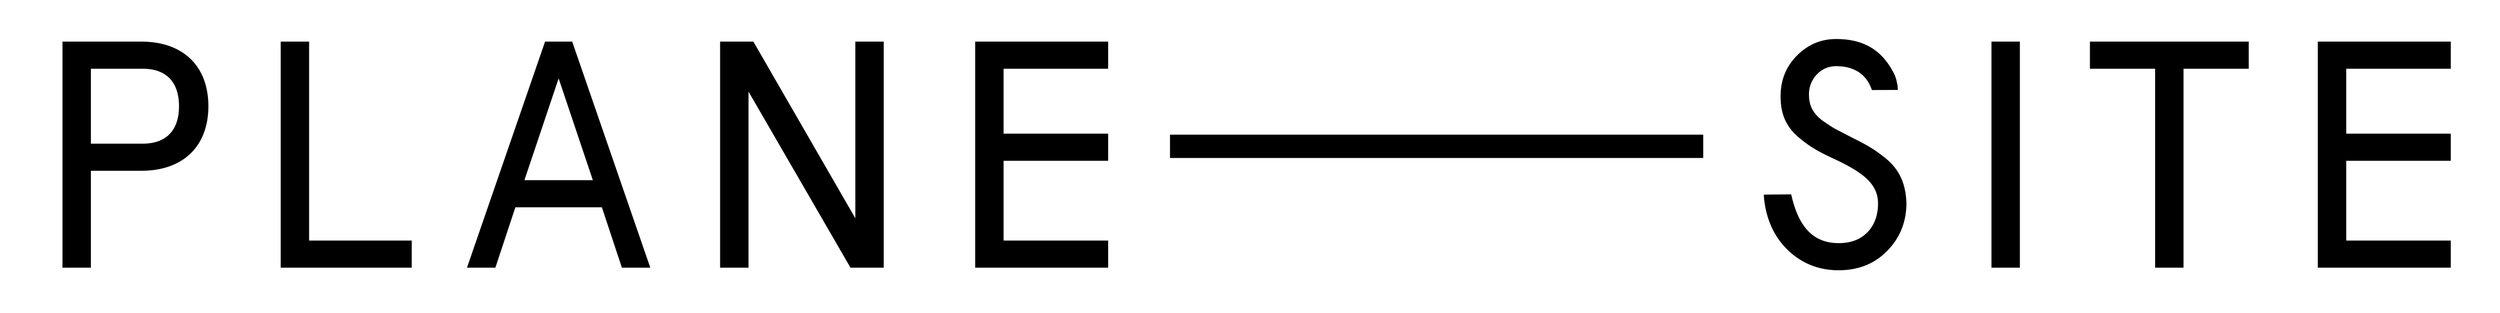 plane—site-logo-white copy.jpg